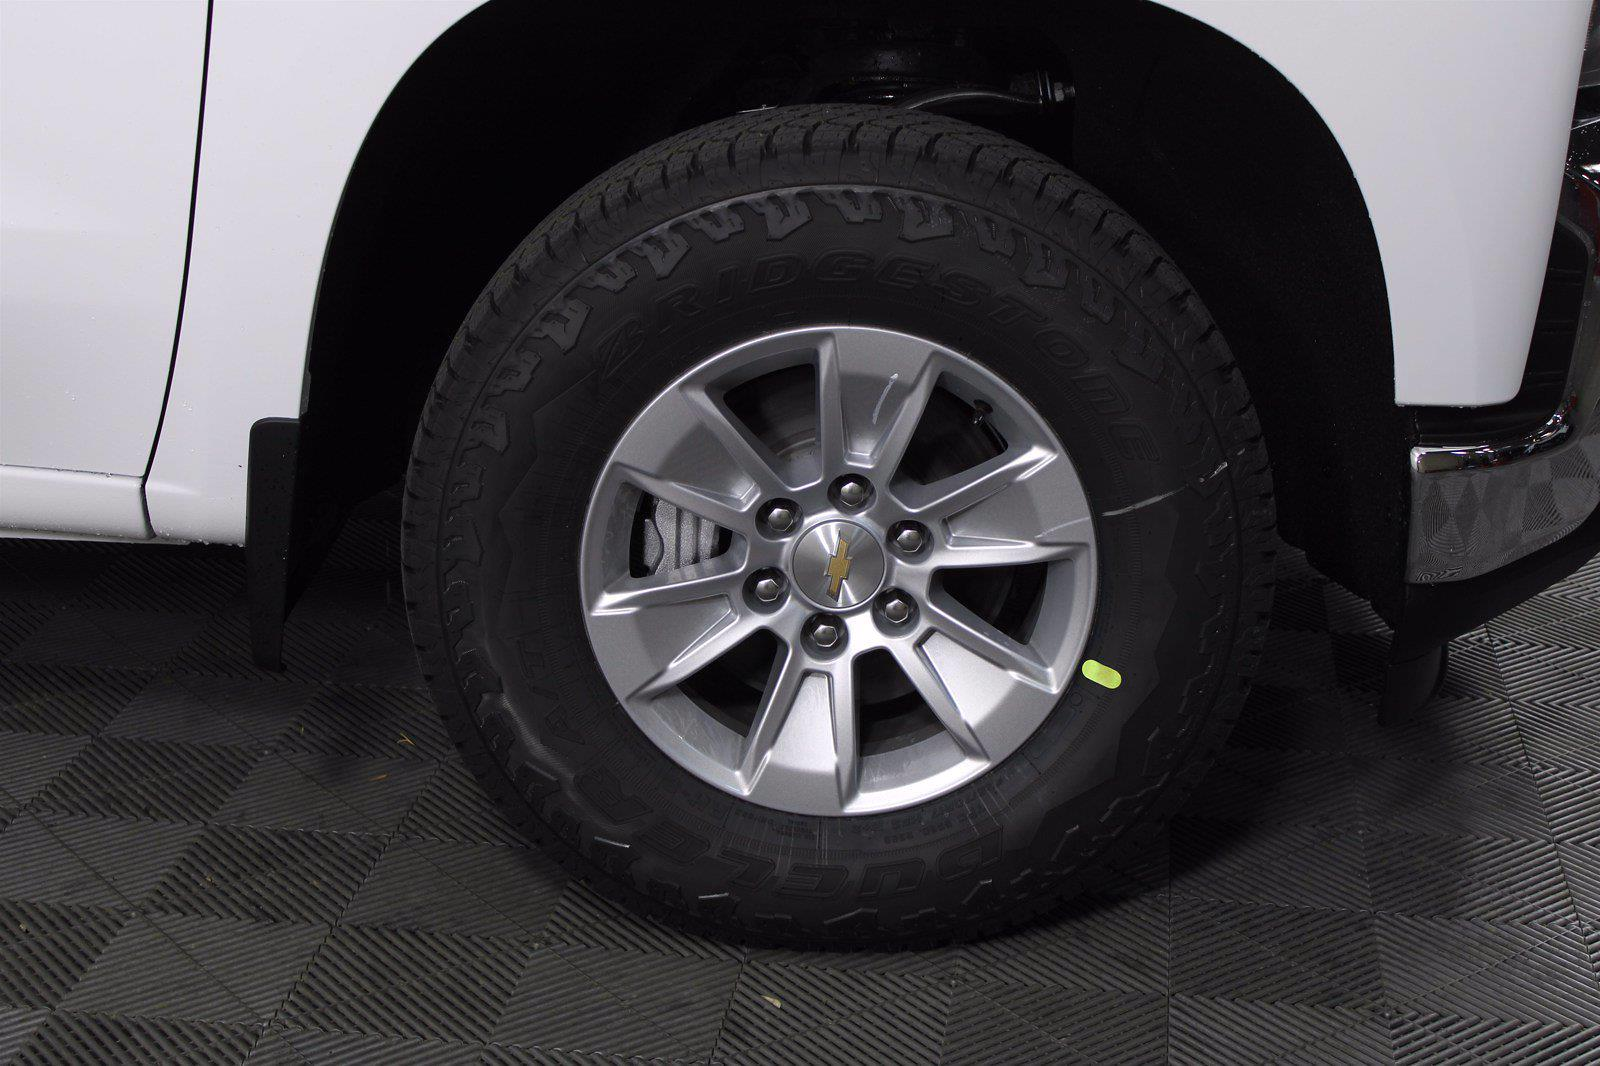 2021 Chevrolet Silverado 1500 Regular Cab 4x2, Pickup #D110764 - photo 6